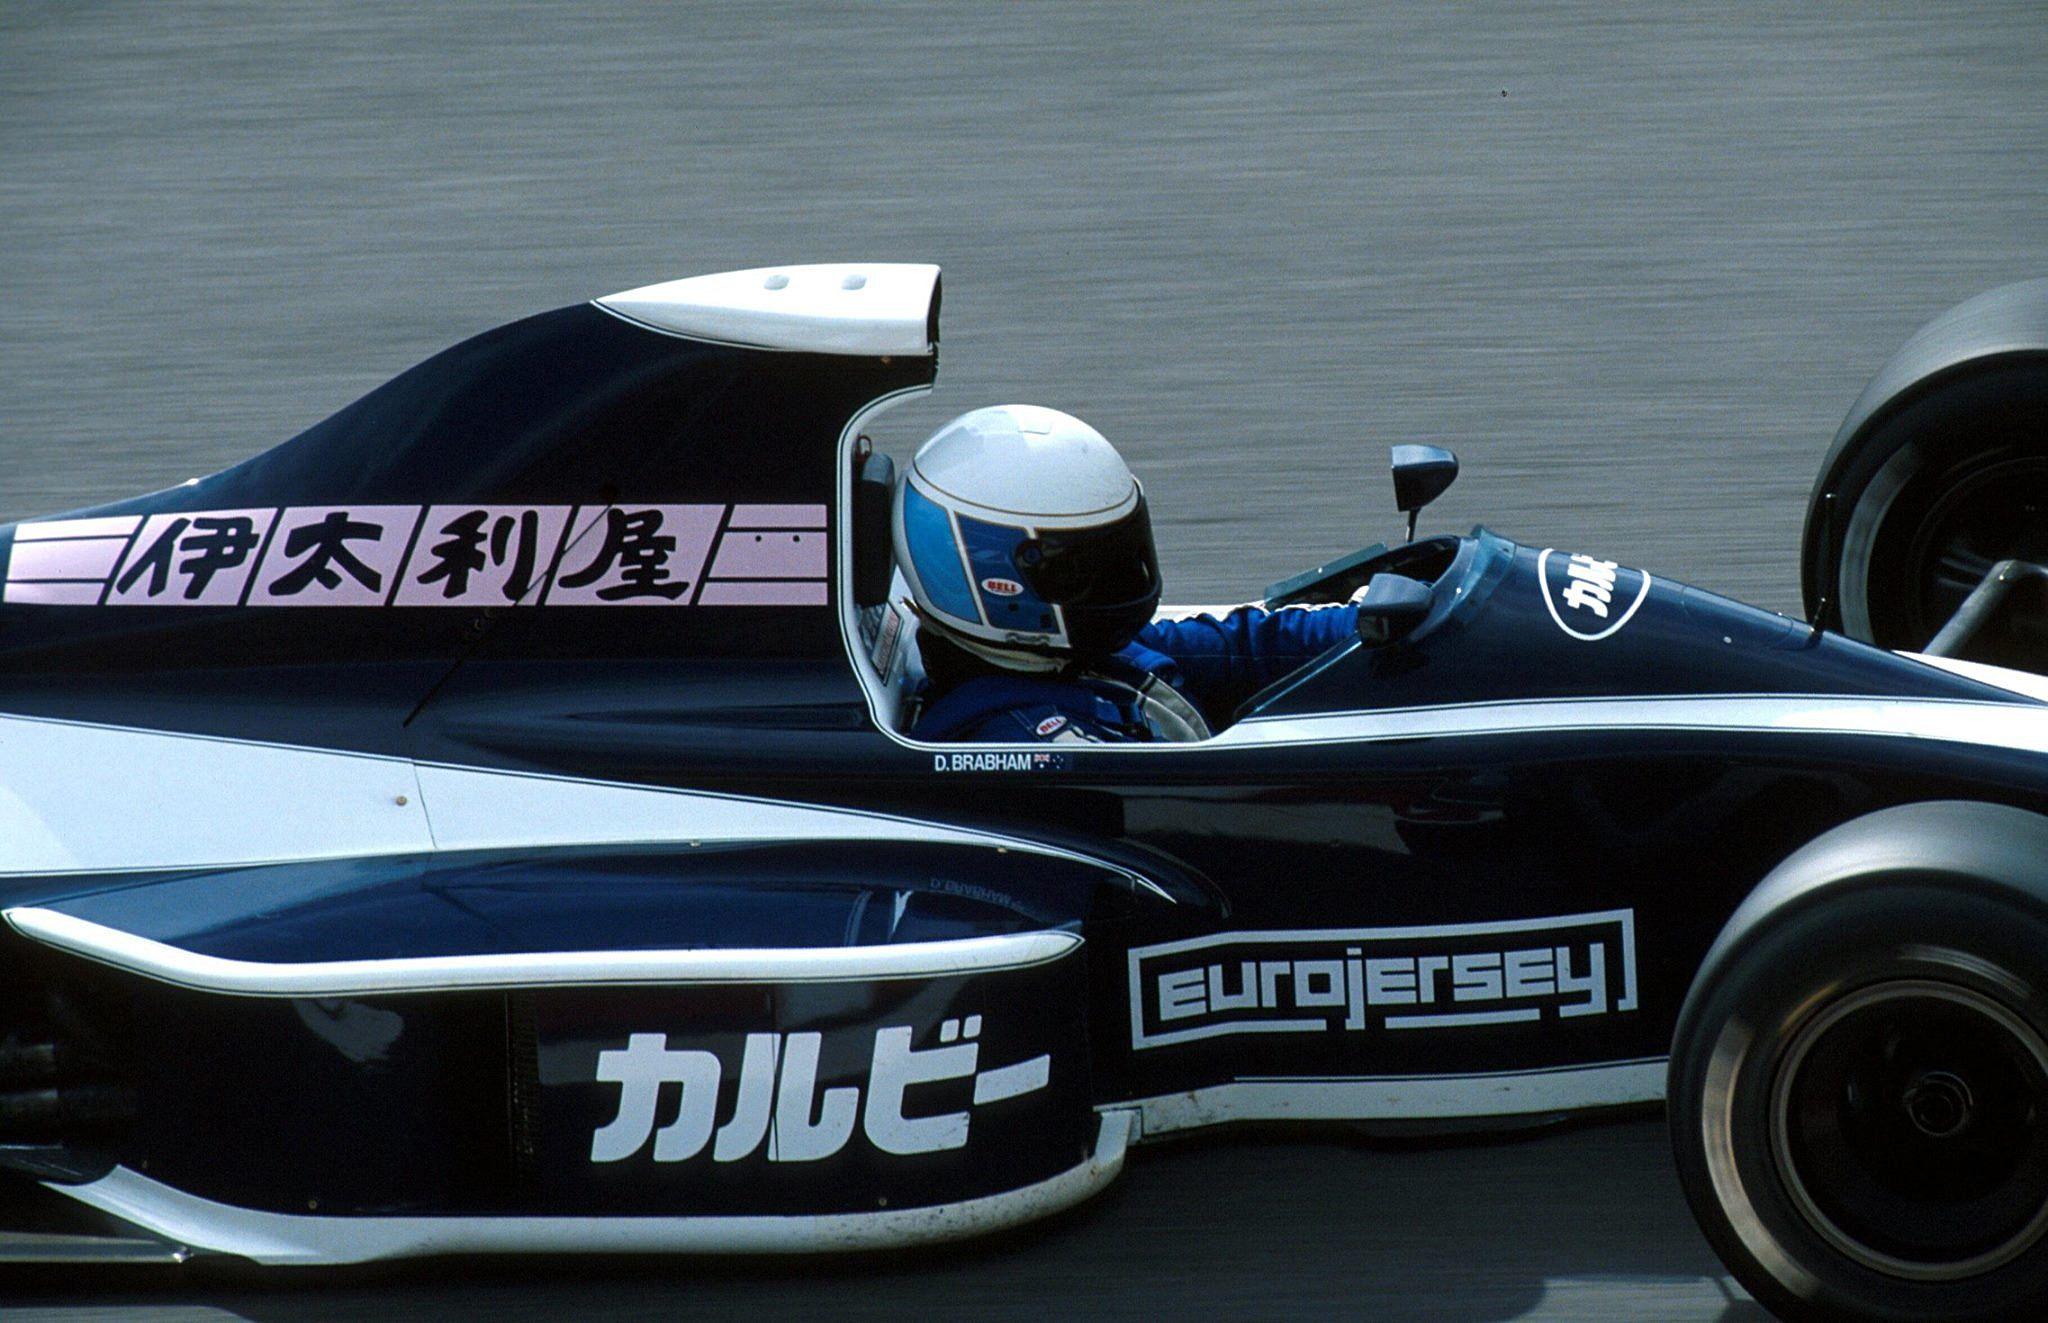 1990 - Japan - Brabham - David Brabham | Auto Racing #1 | Pinterest ...